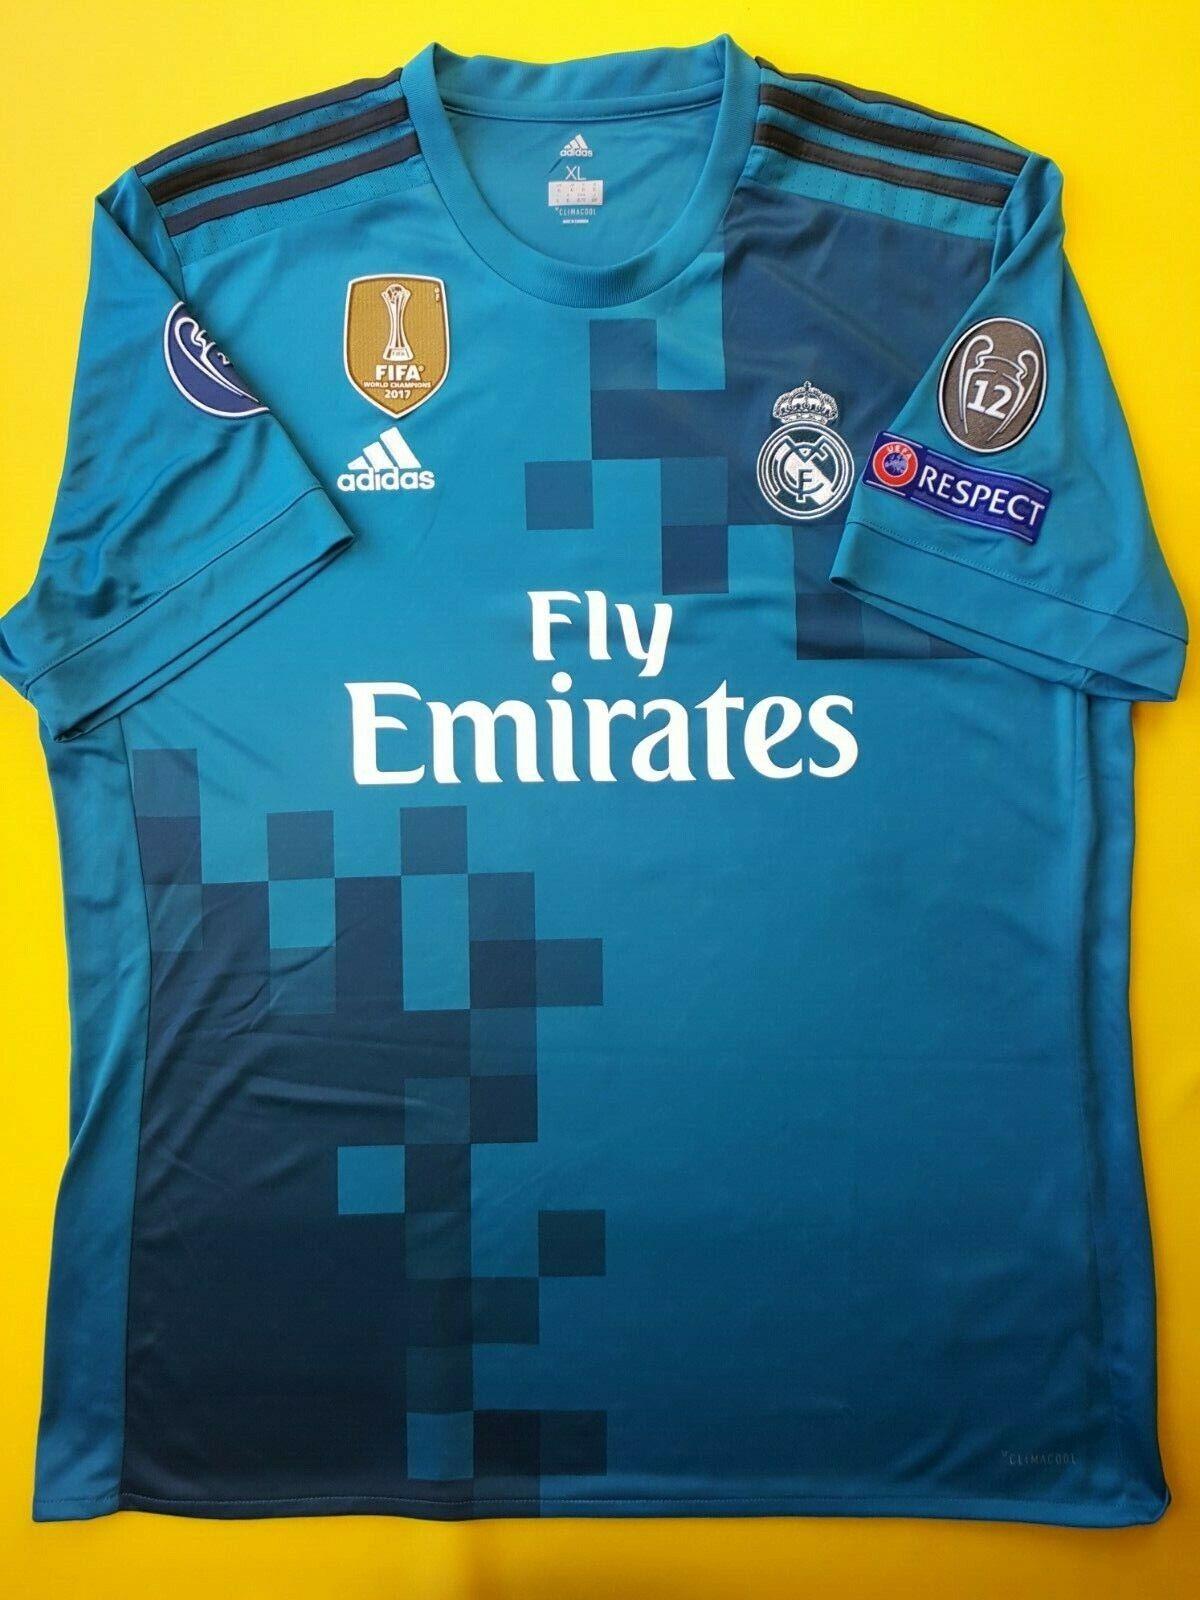 3c7c06d0c 4.9 5 Real Madrid third jersey XL 2018 shirt soccer Adidas football ig93